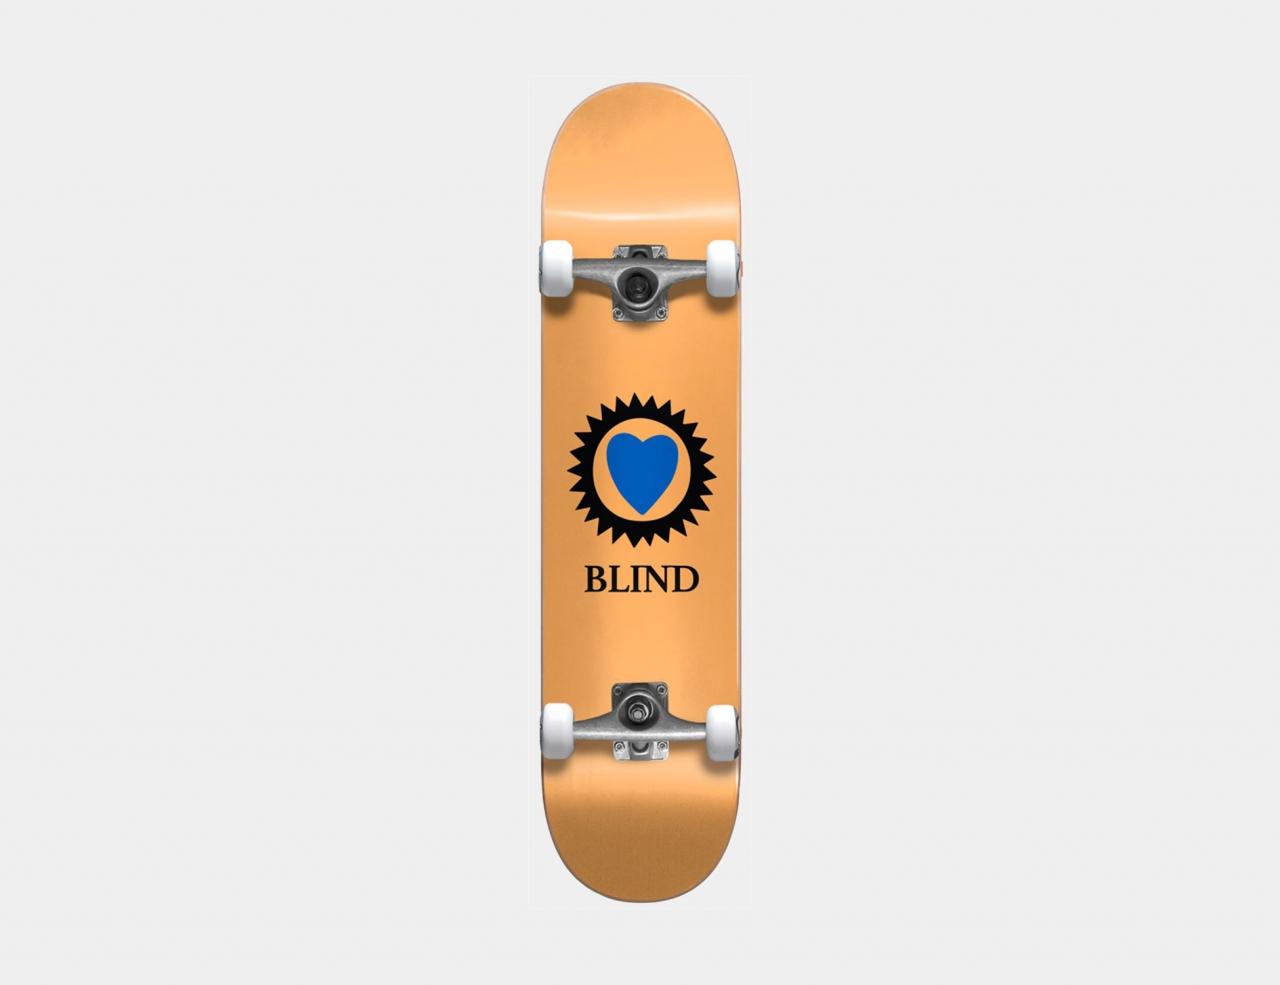 Blind Mini Heart 7.0 Komplettdeck